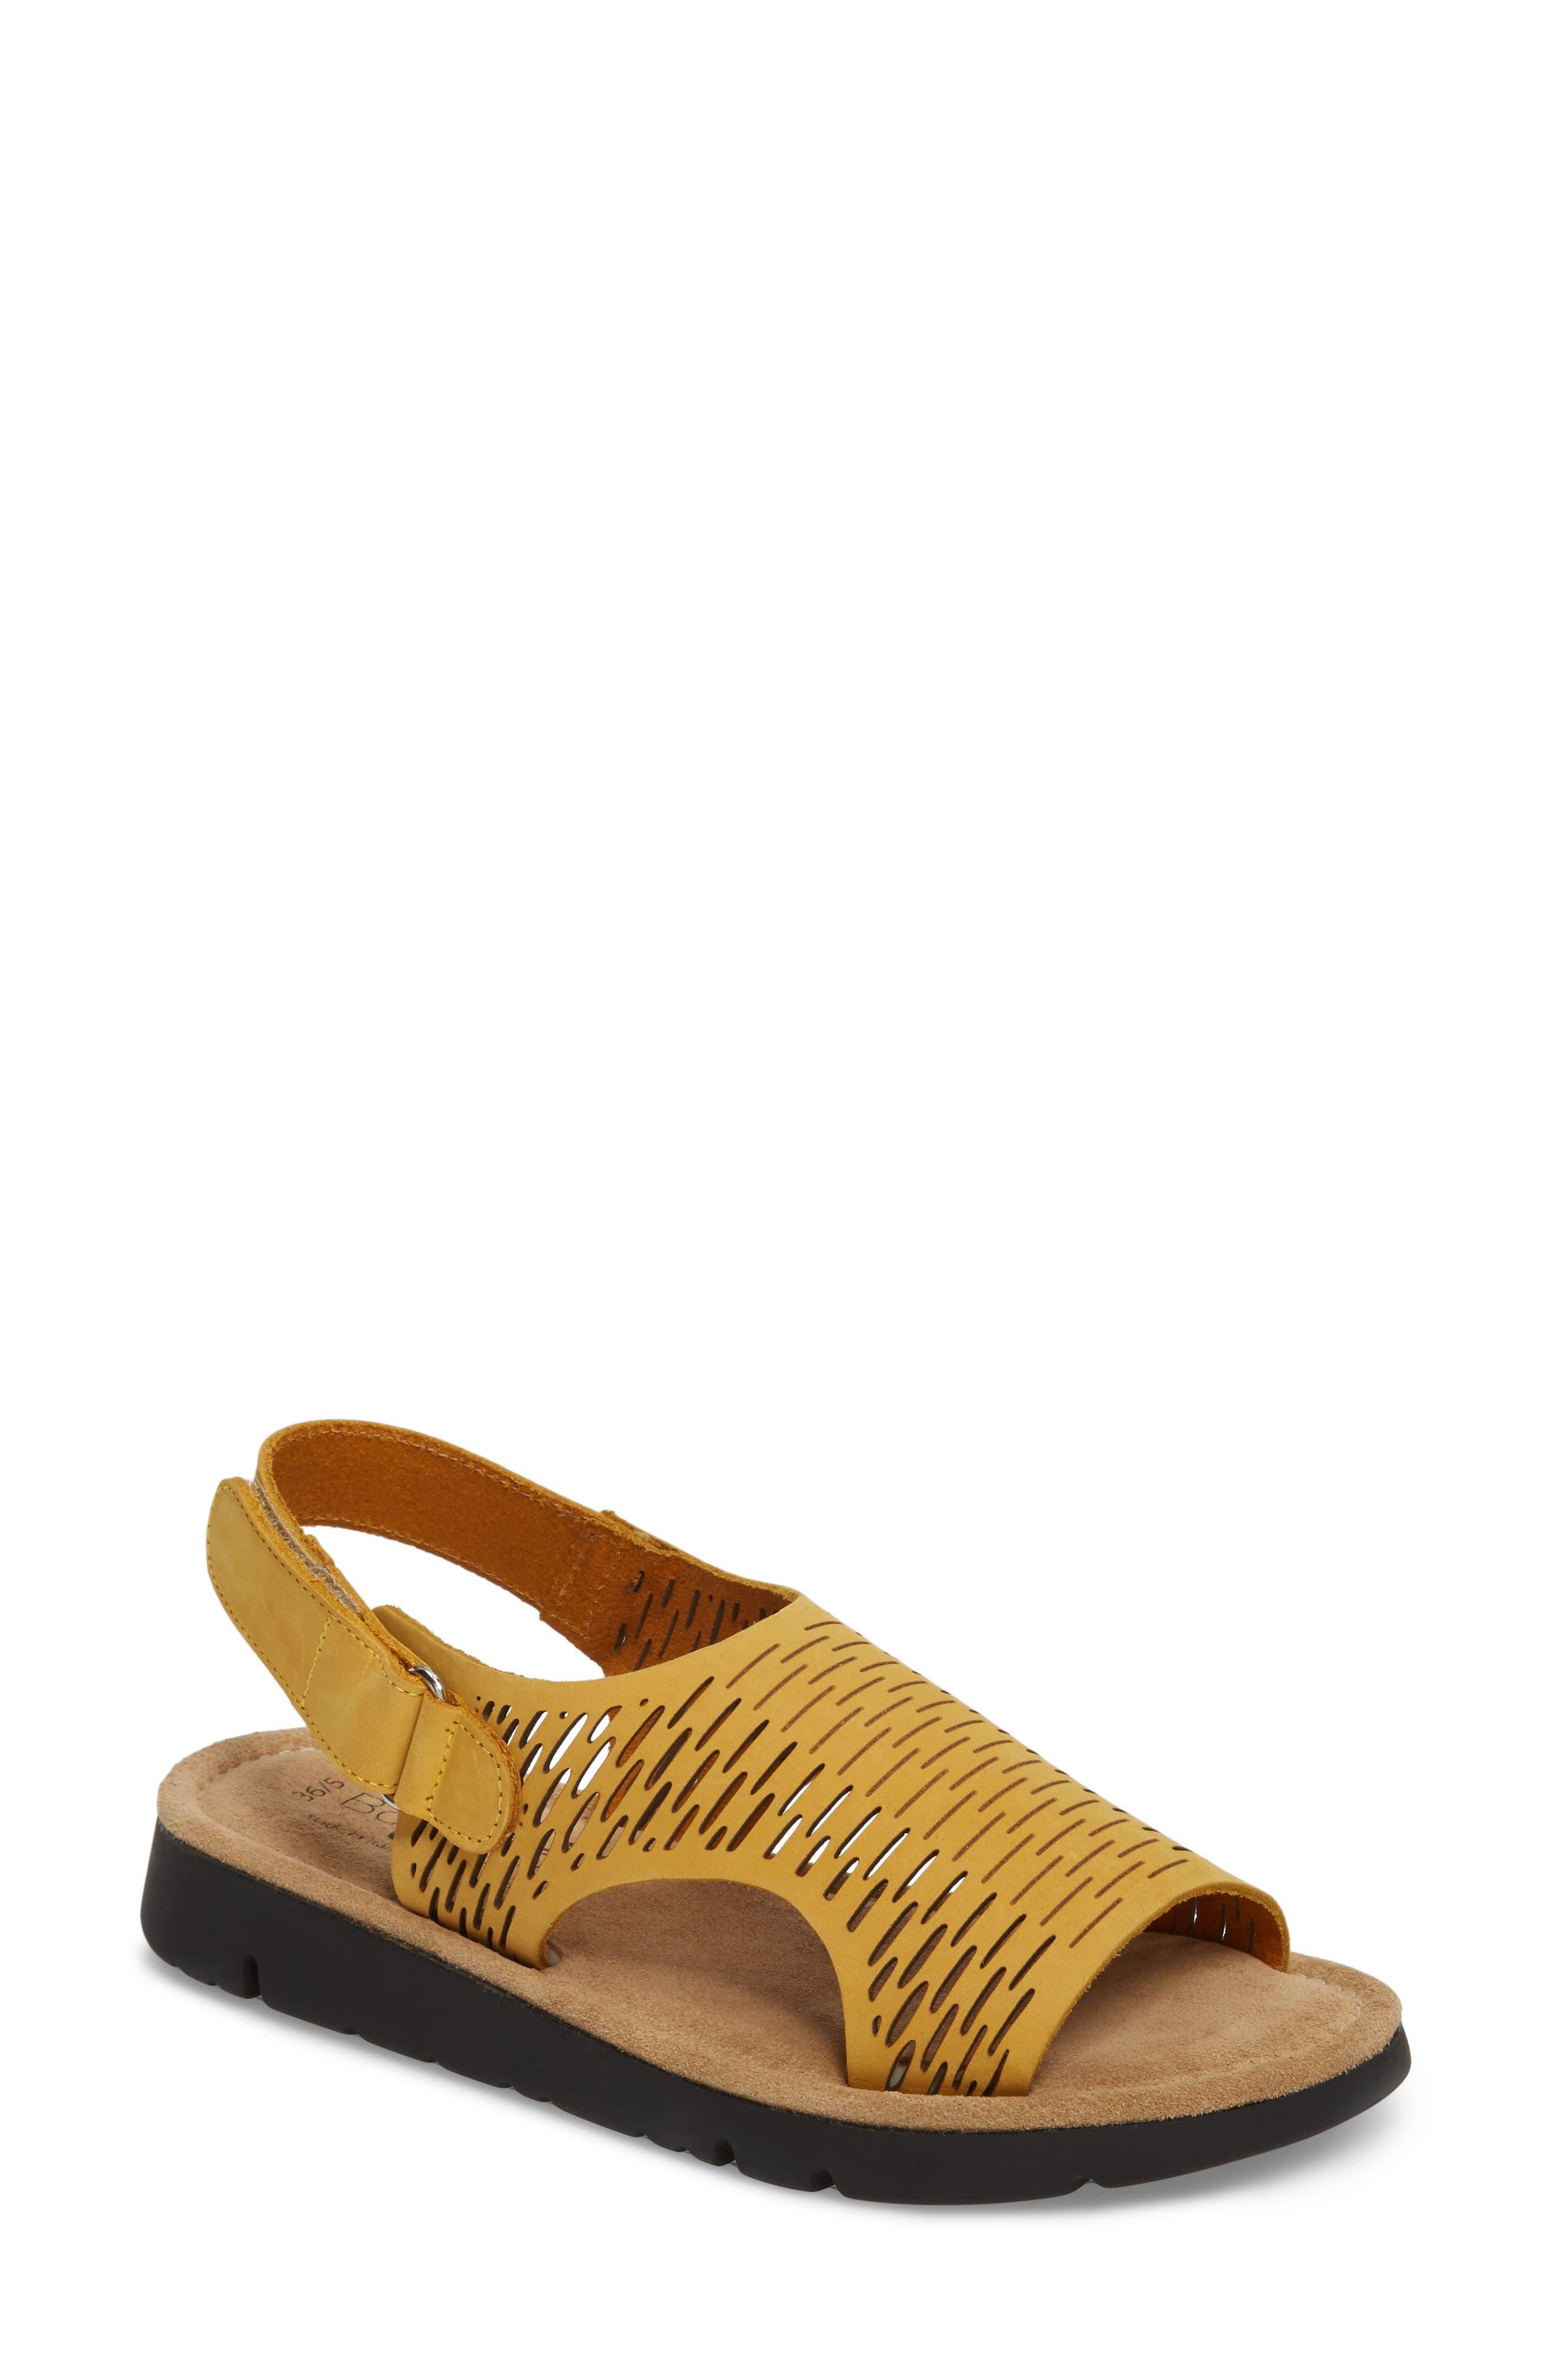 Saga Sandal,                         Main,                         color, Mustard Nubuck Leather